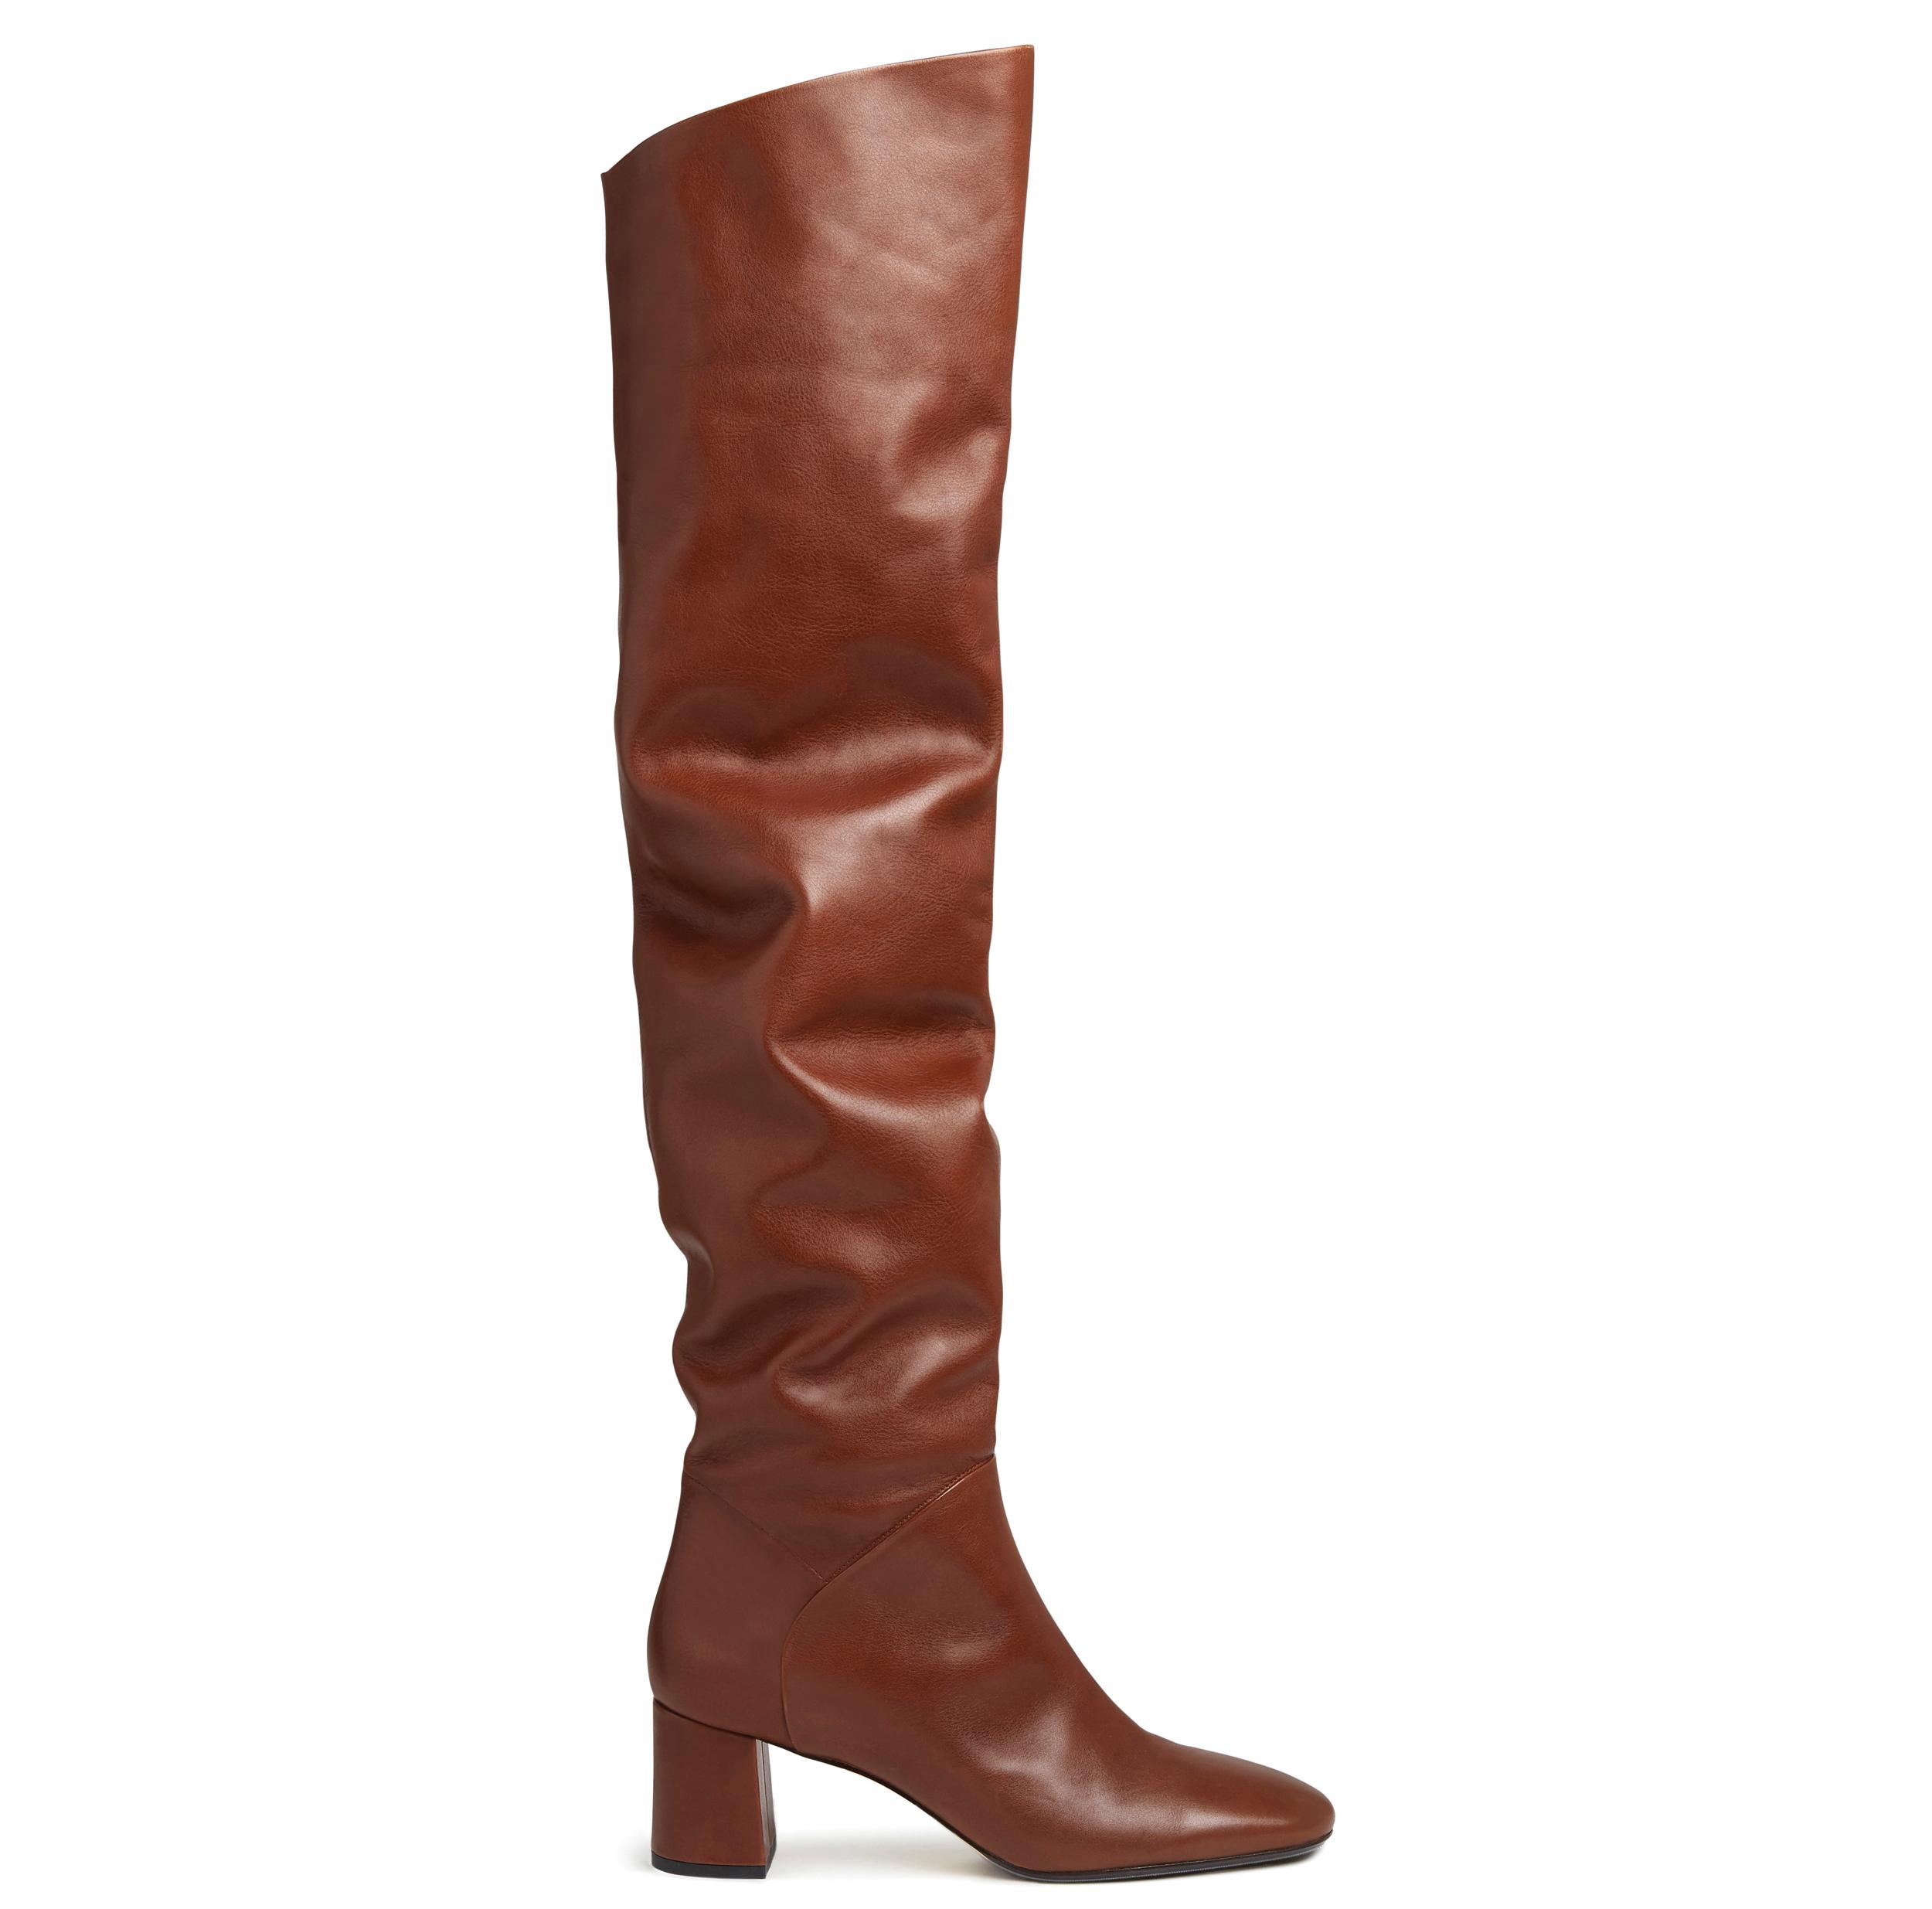 Hobbs Imogen Over the Knee Boots, £329/AED1,485.04